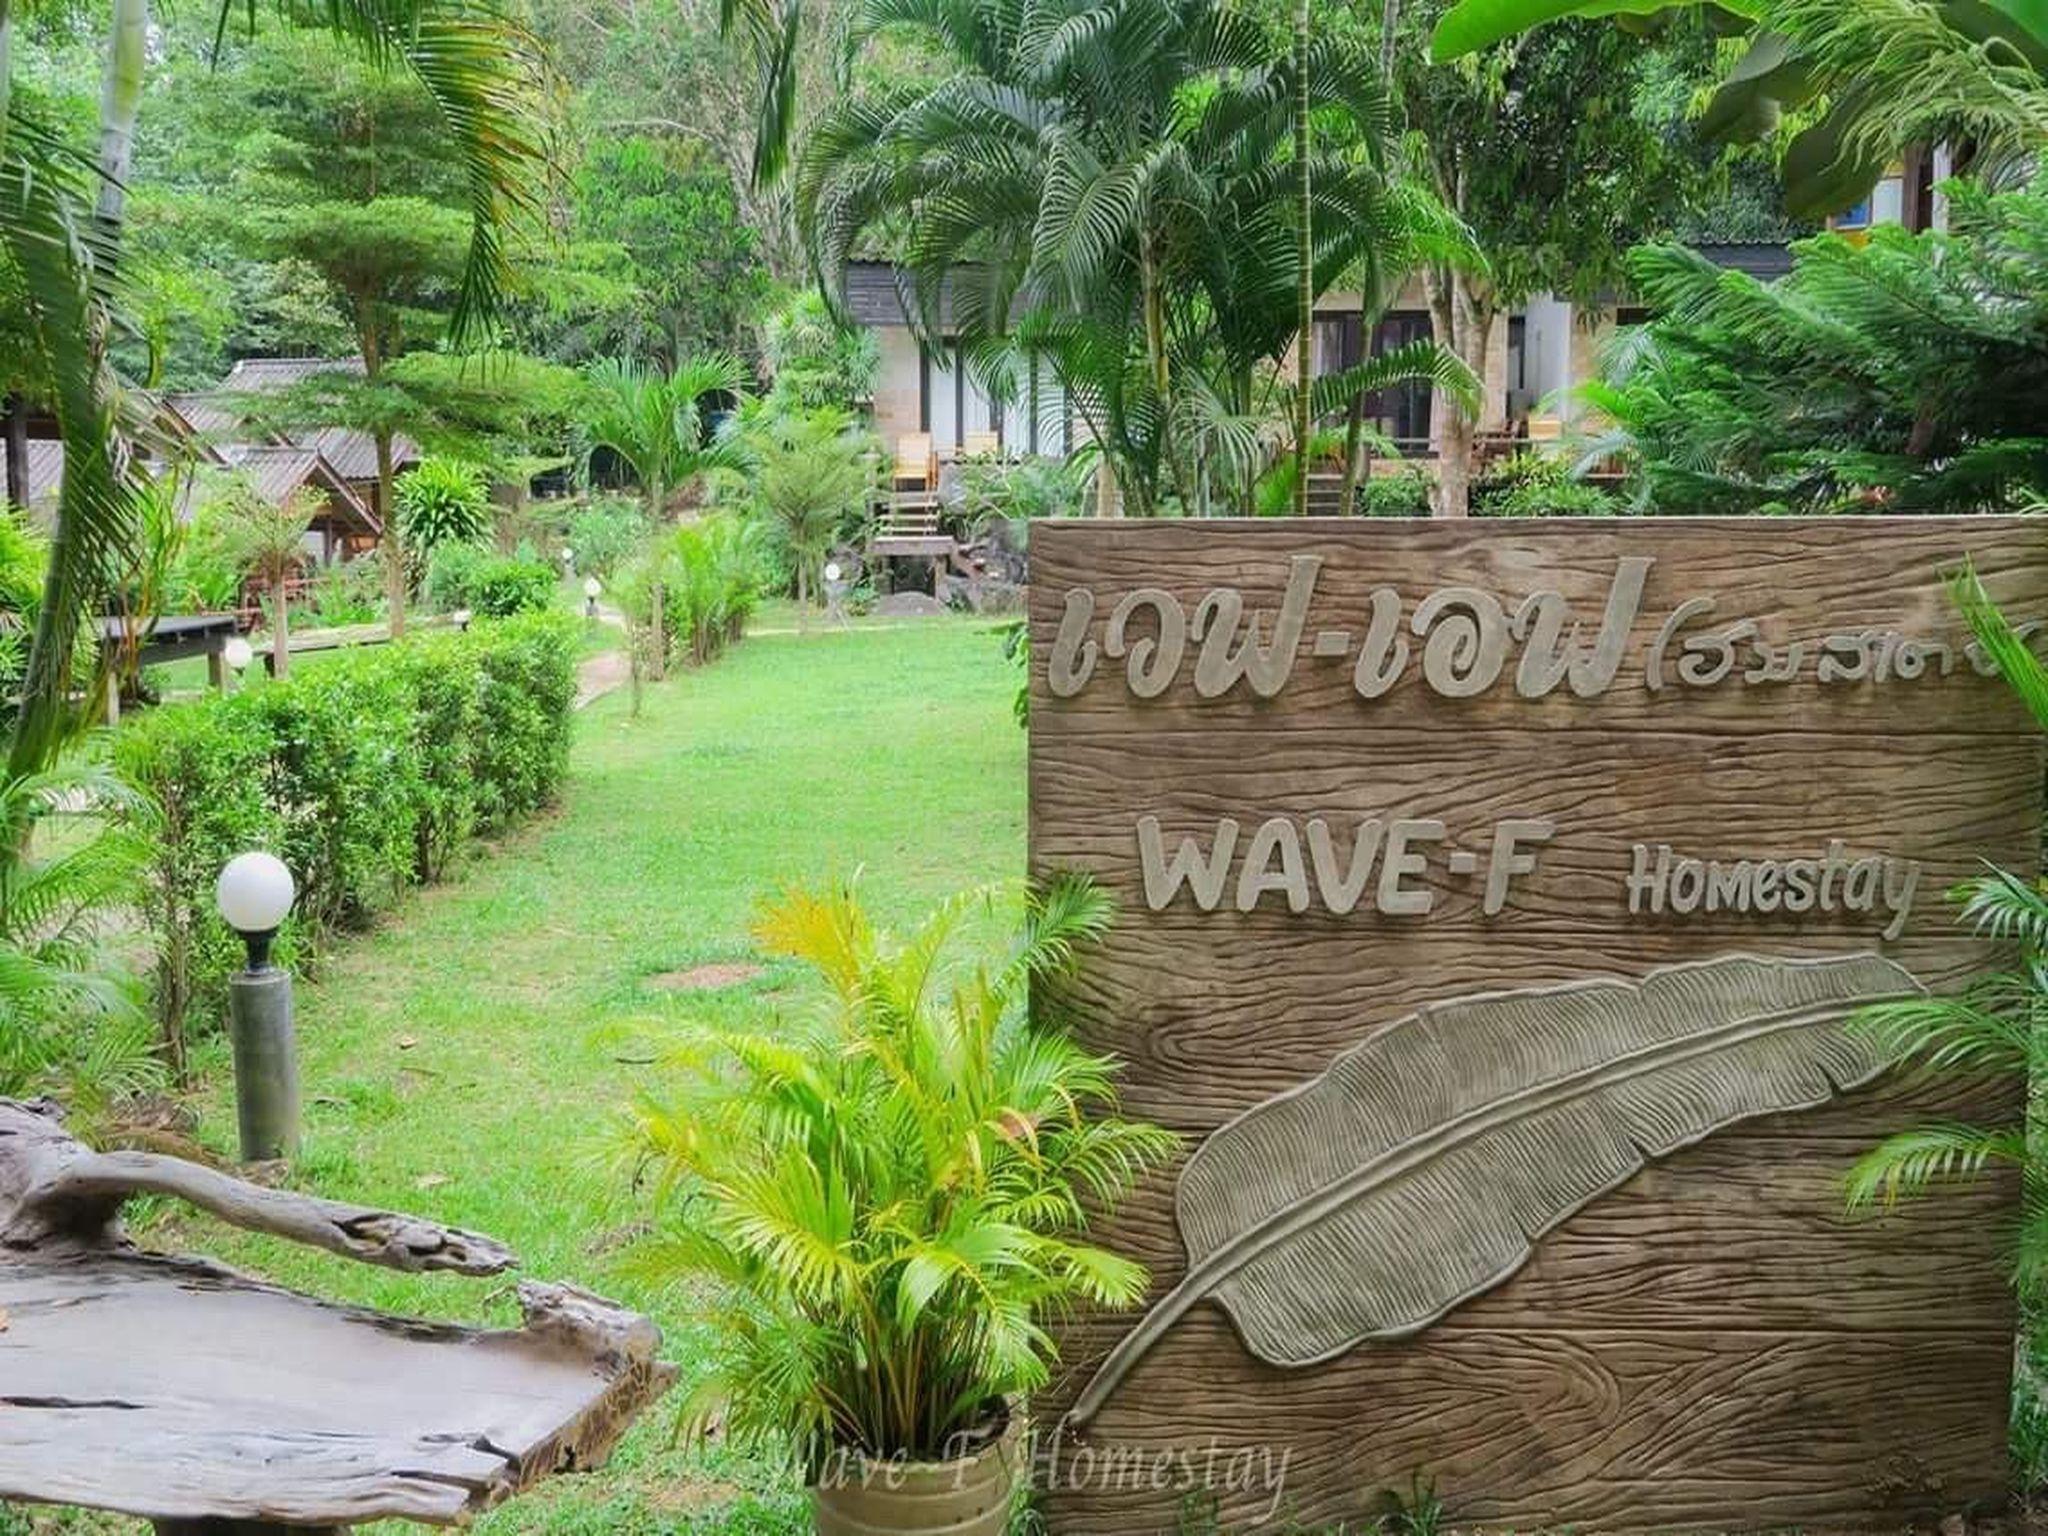 Wave F Homestay